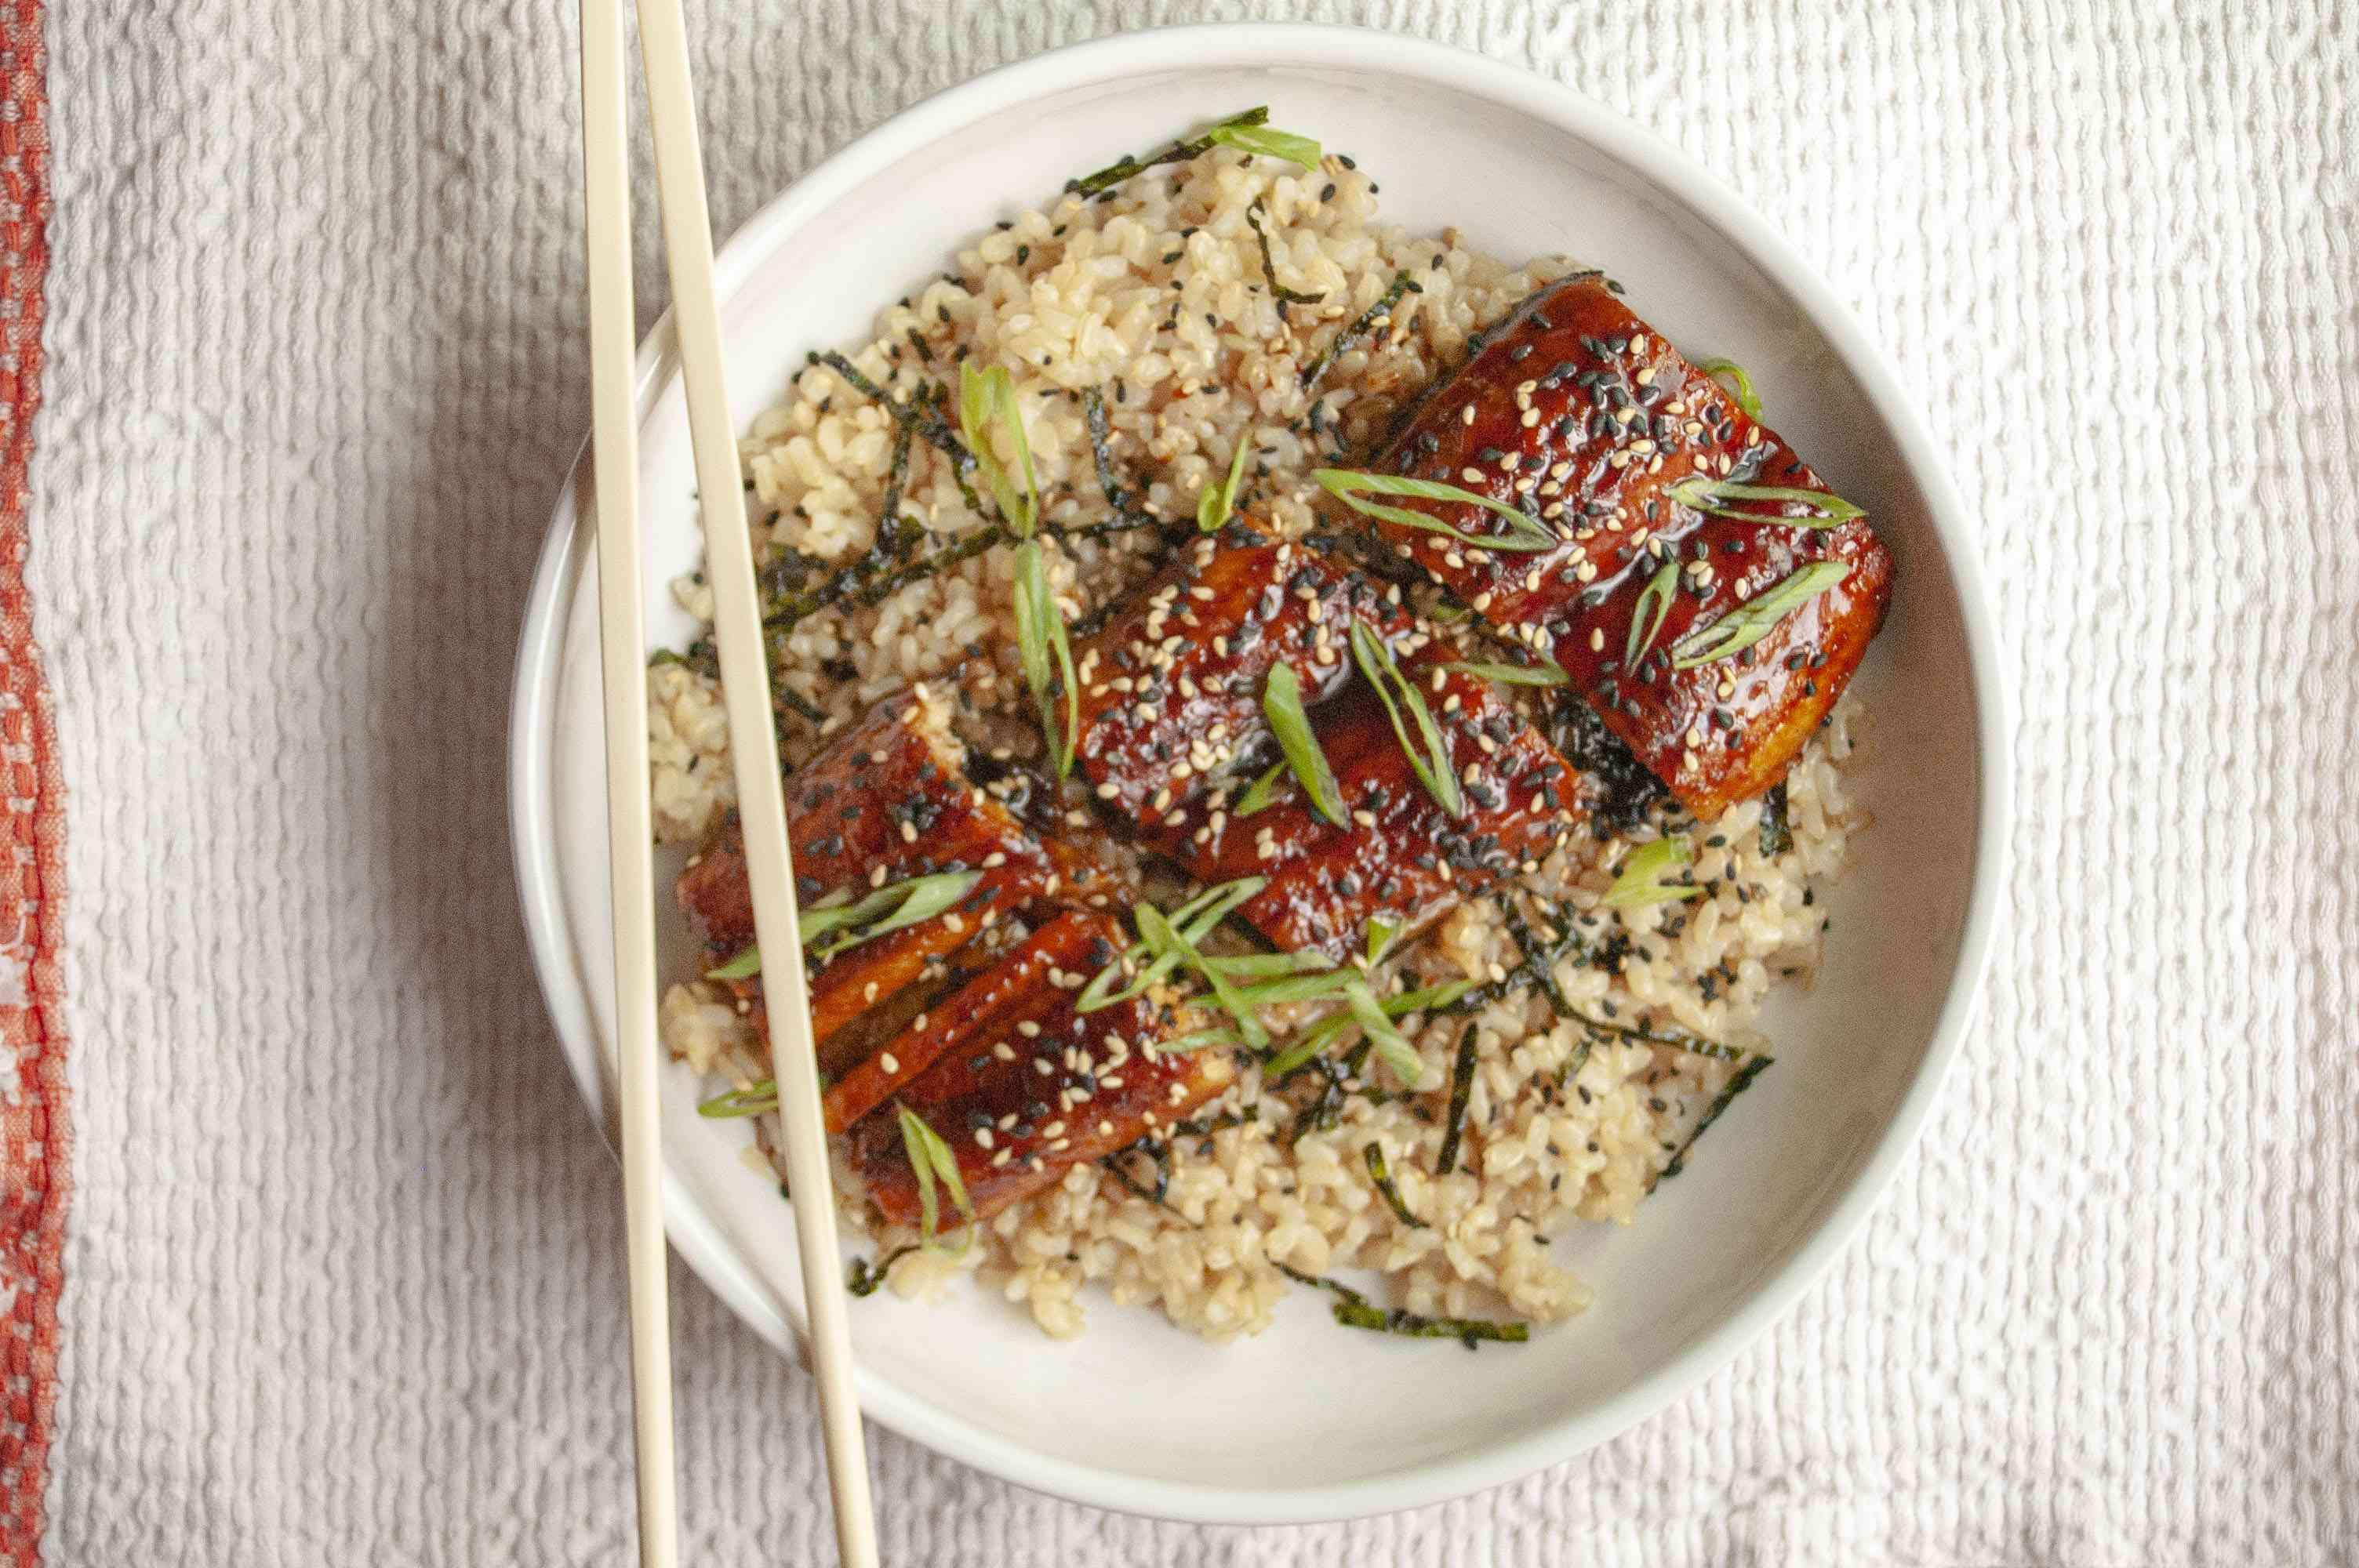 Eel with eel sauce on top of rice